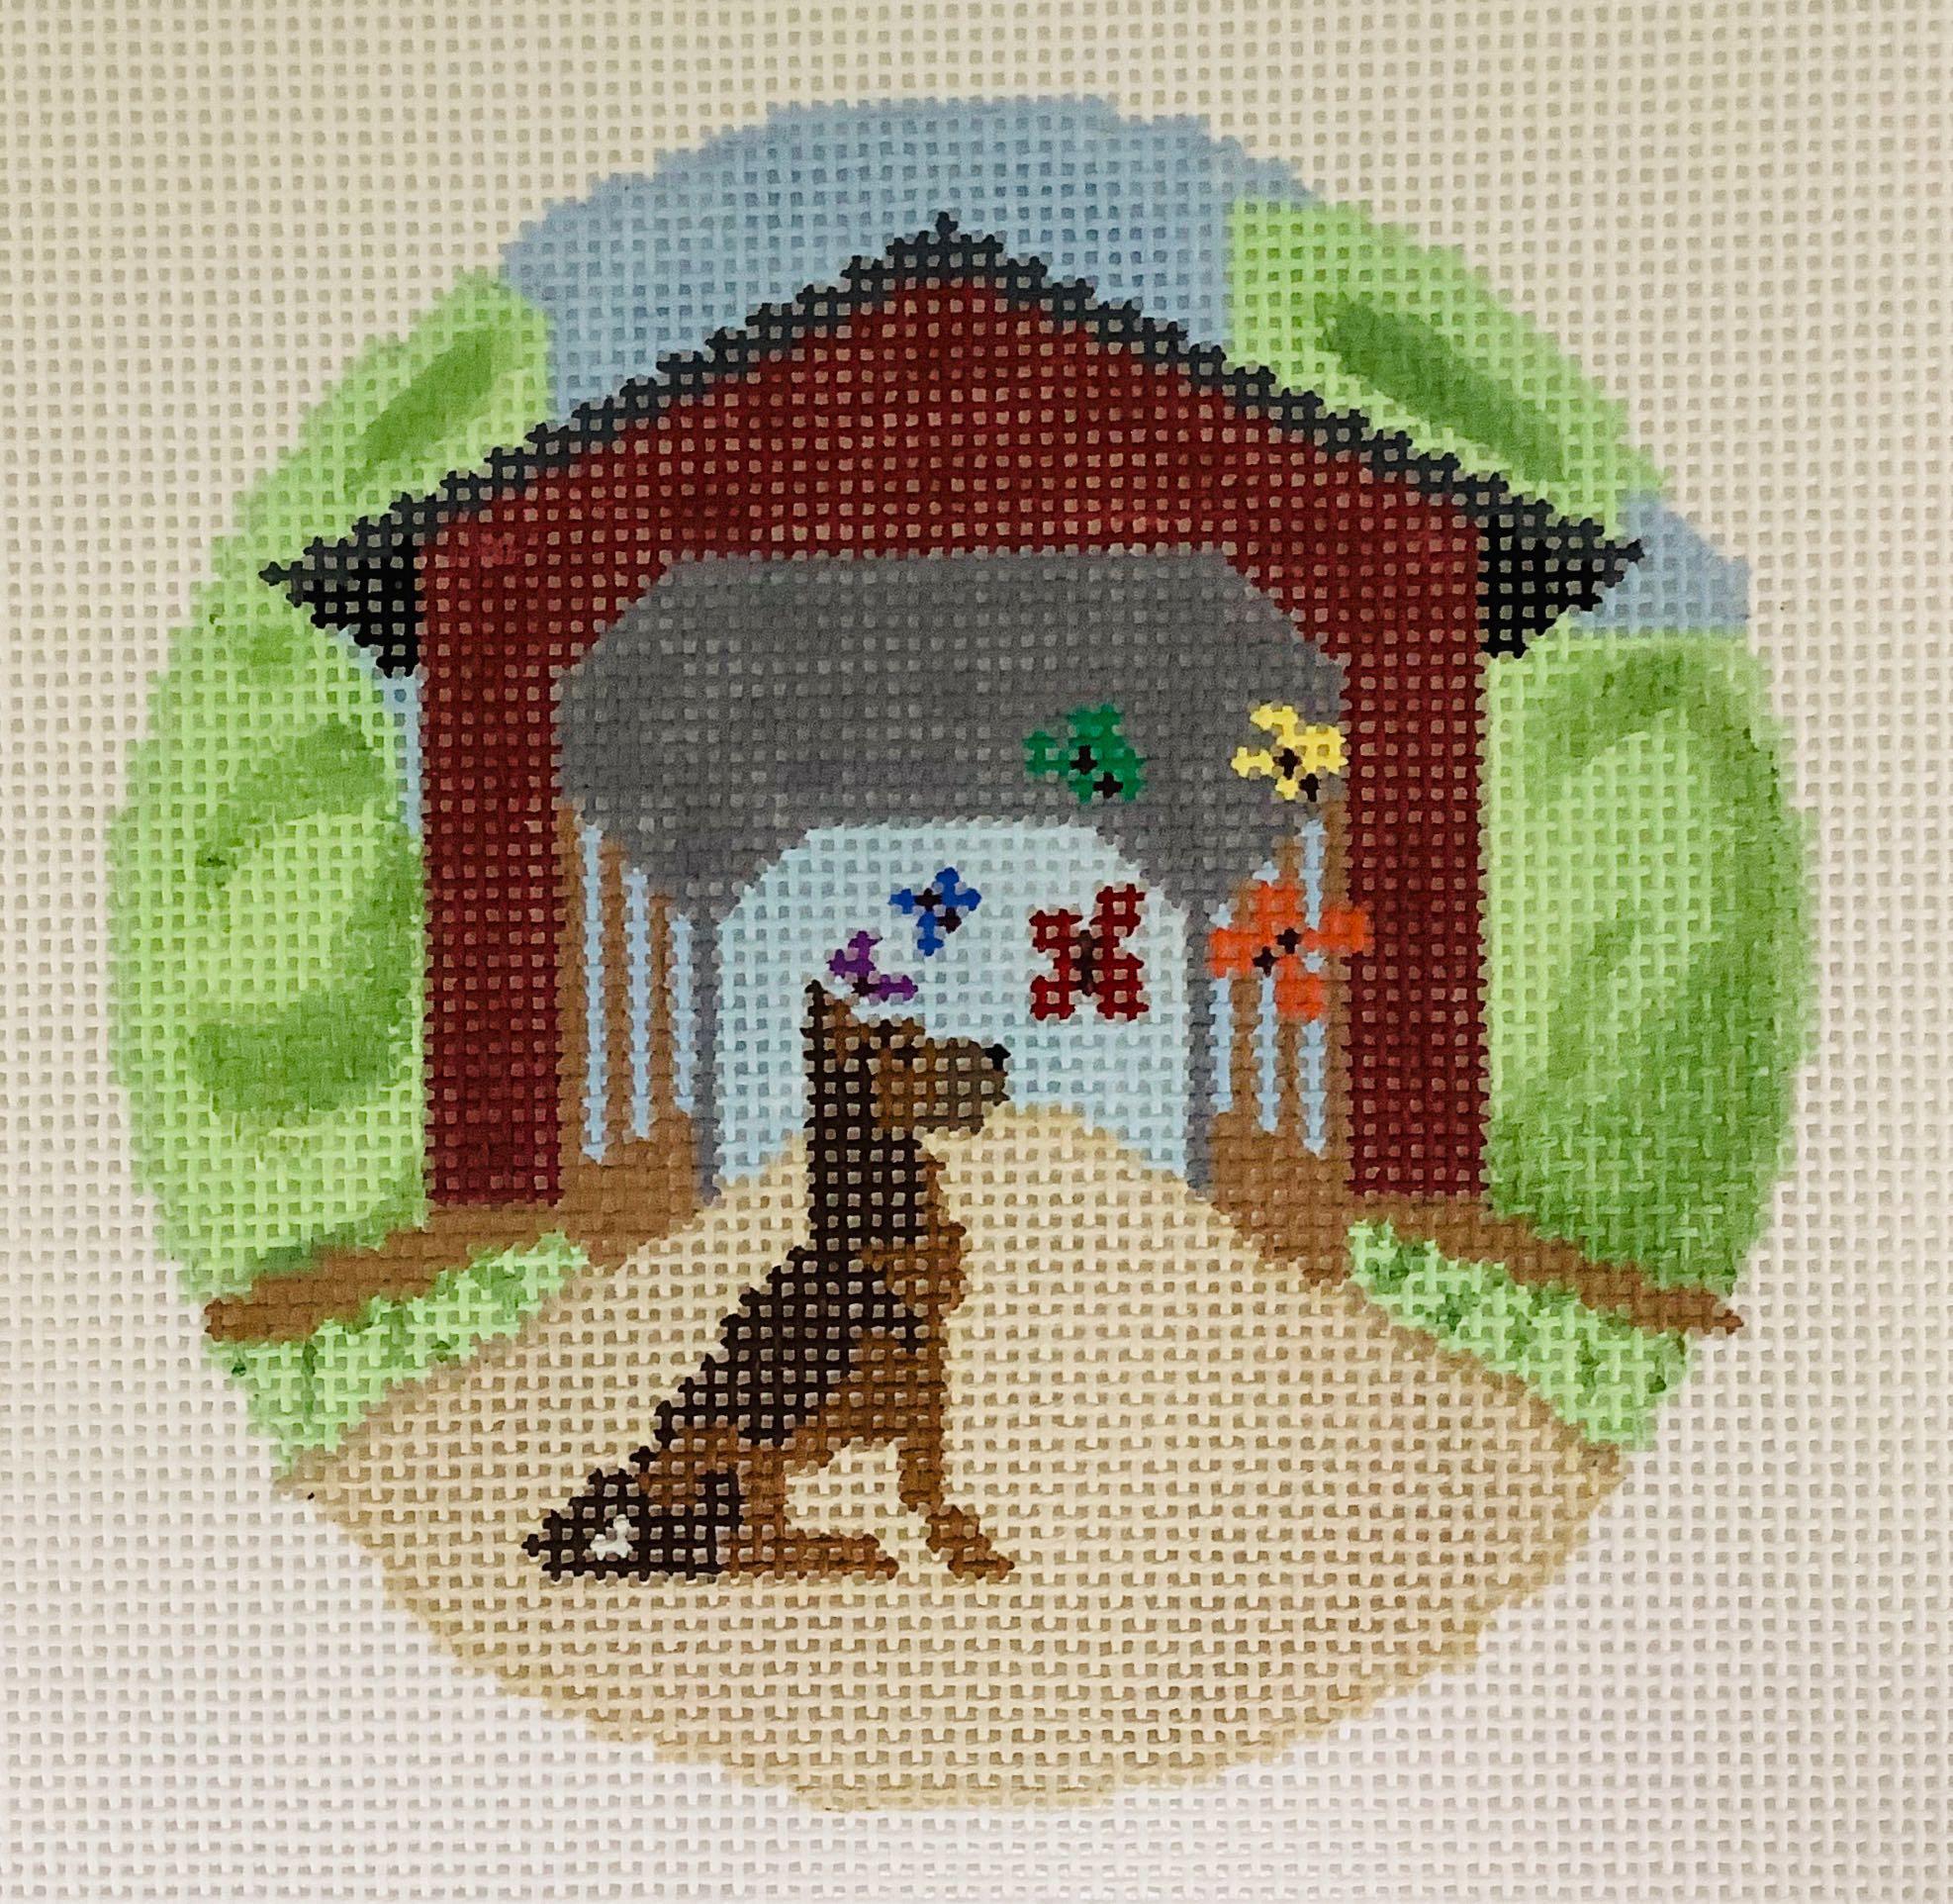 T4 Rainbow Bridge Shepherd Dog Ornament Blue Ridge Stitchery